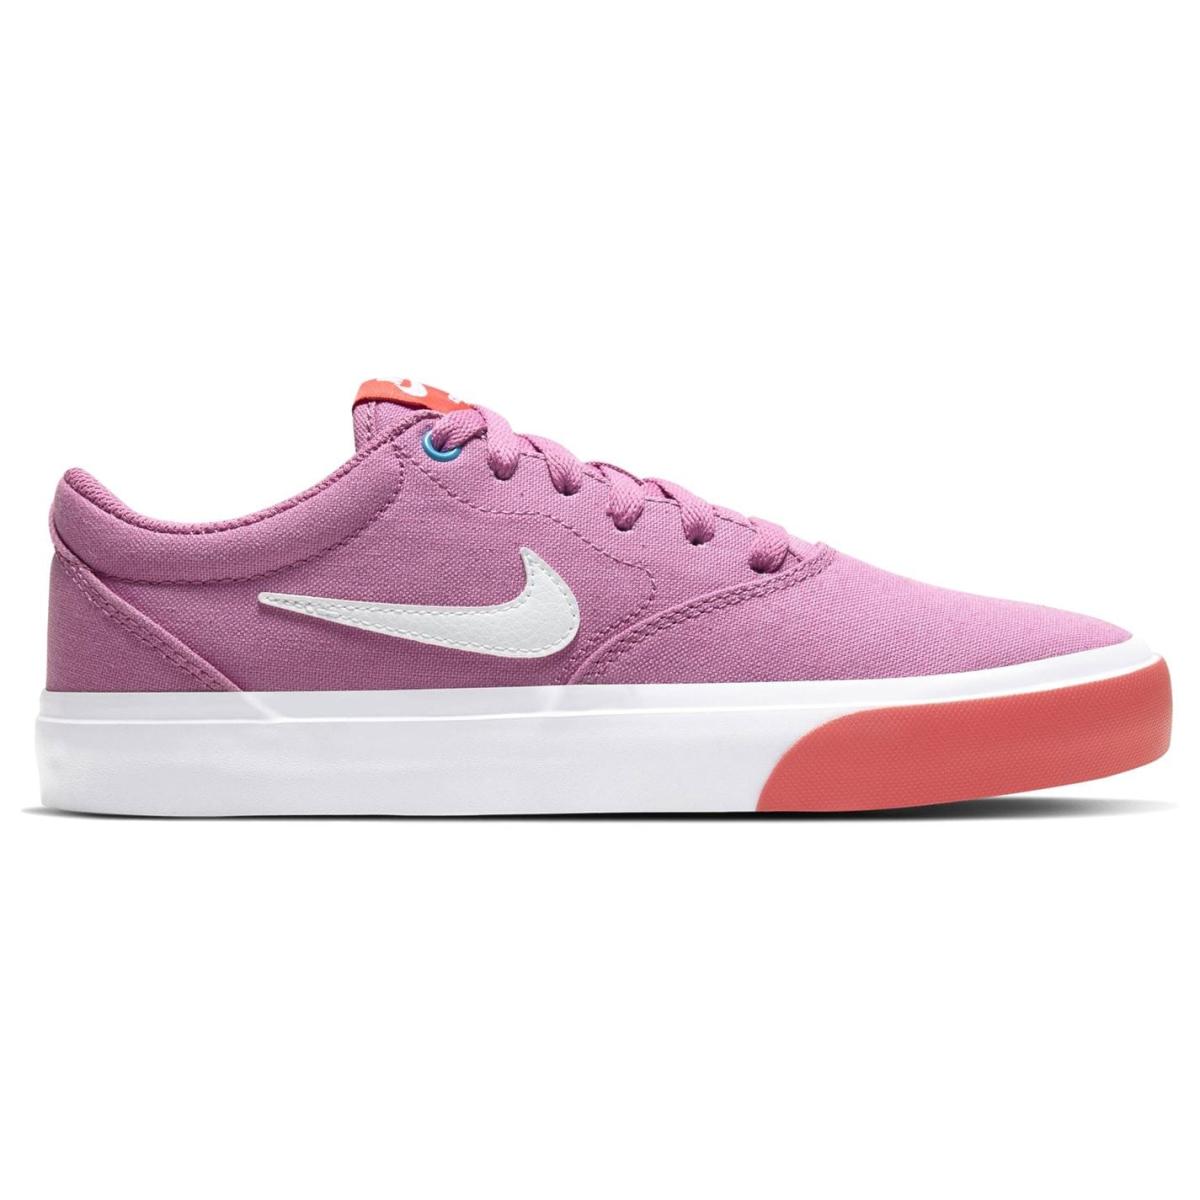 Nike SB Charge Canvas Skateschuhe Damen Turnschuhe Skate Sneaker 4002